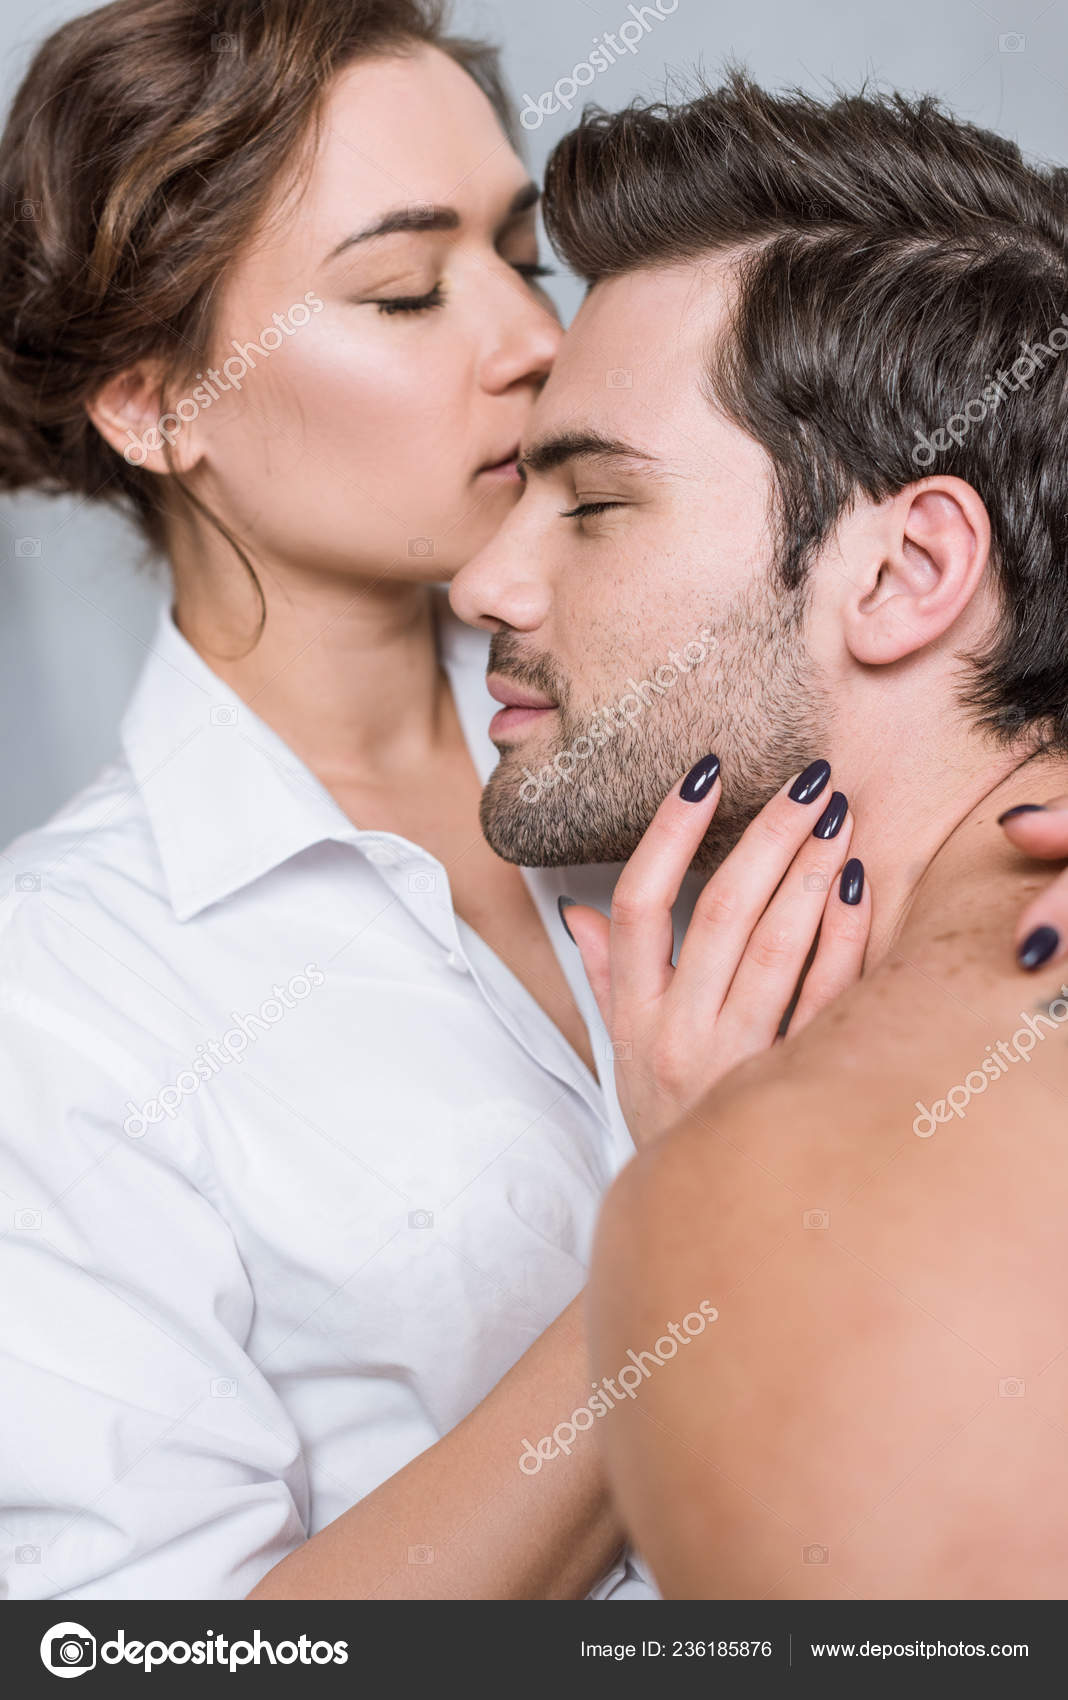 Kissing girlfriend lips boyfriend What age